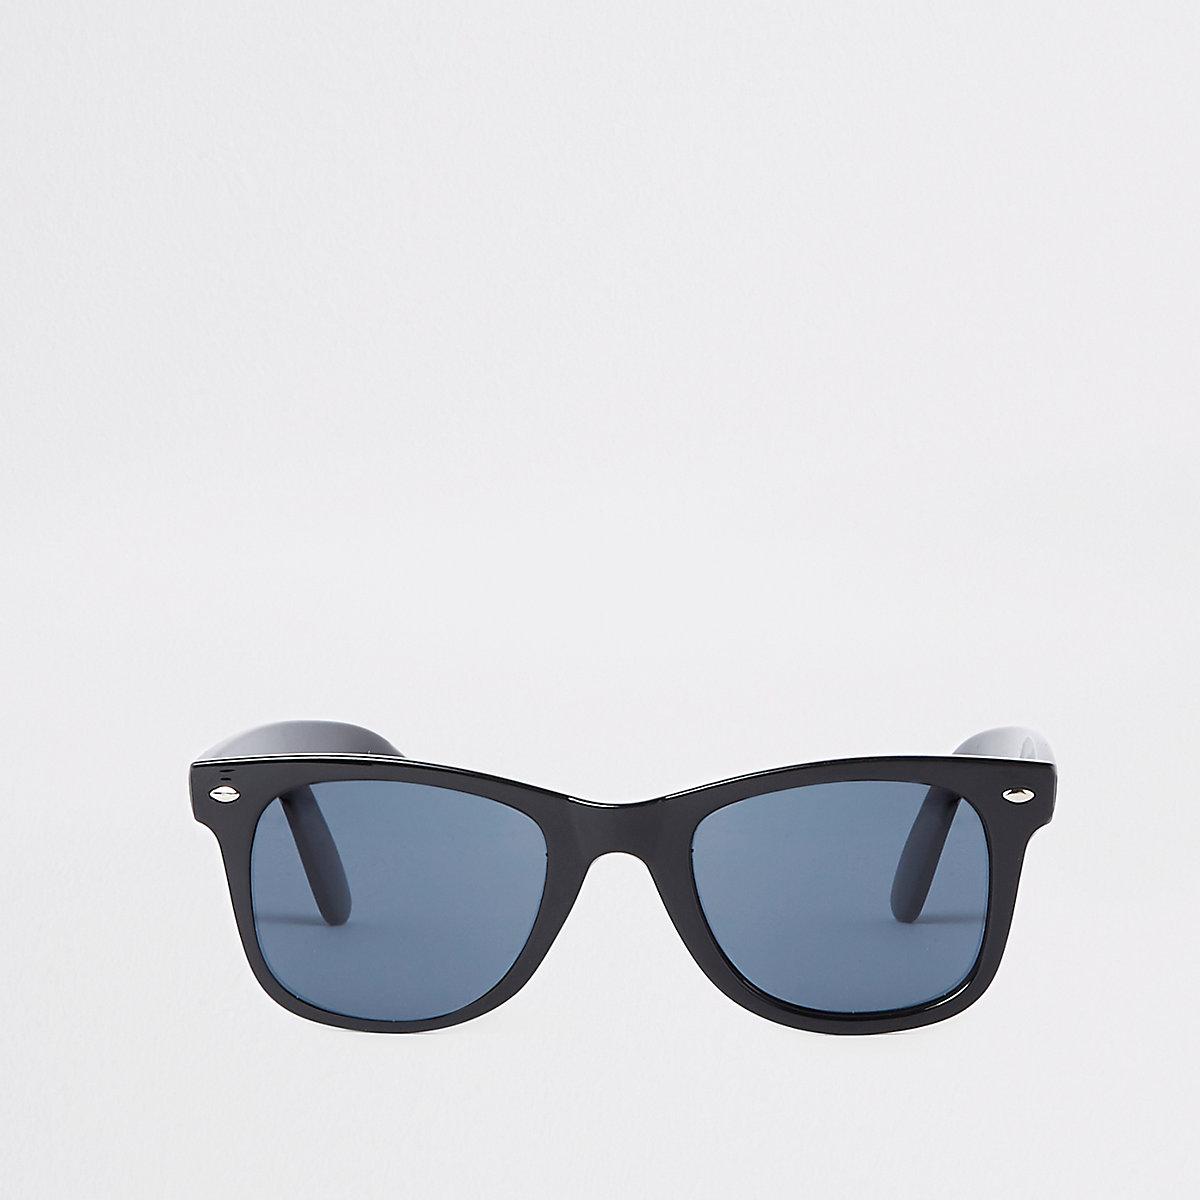 Black slim retro square blue lens sunglasses